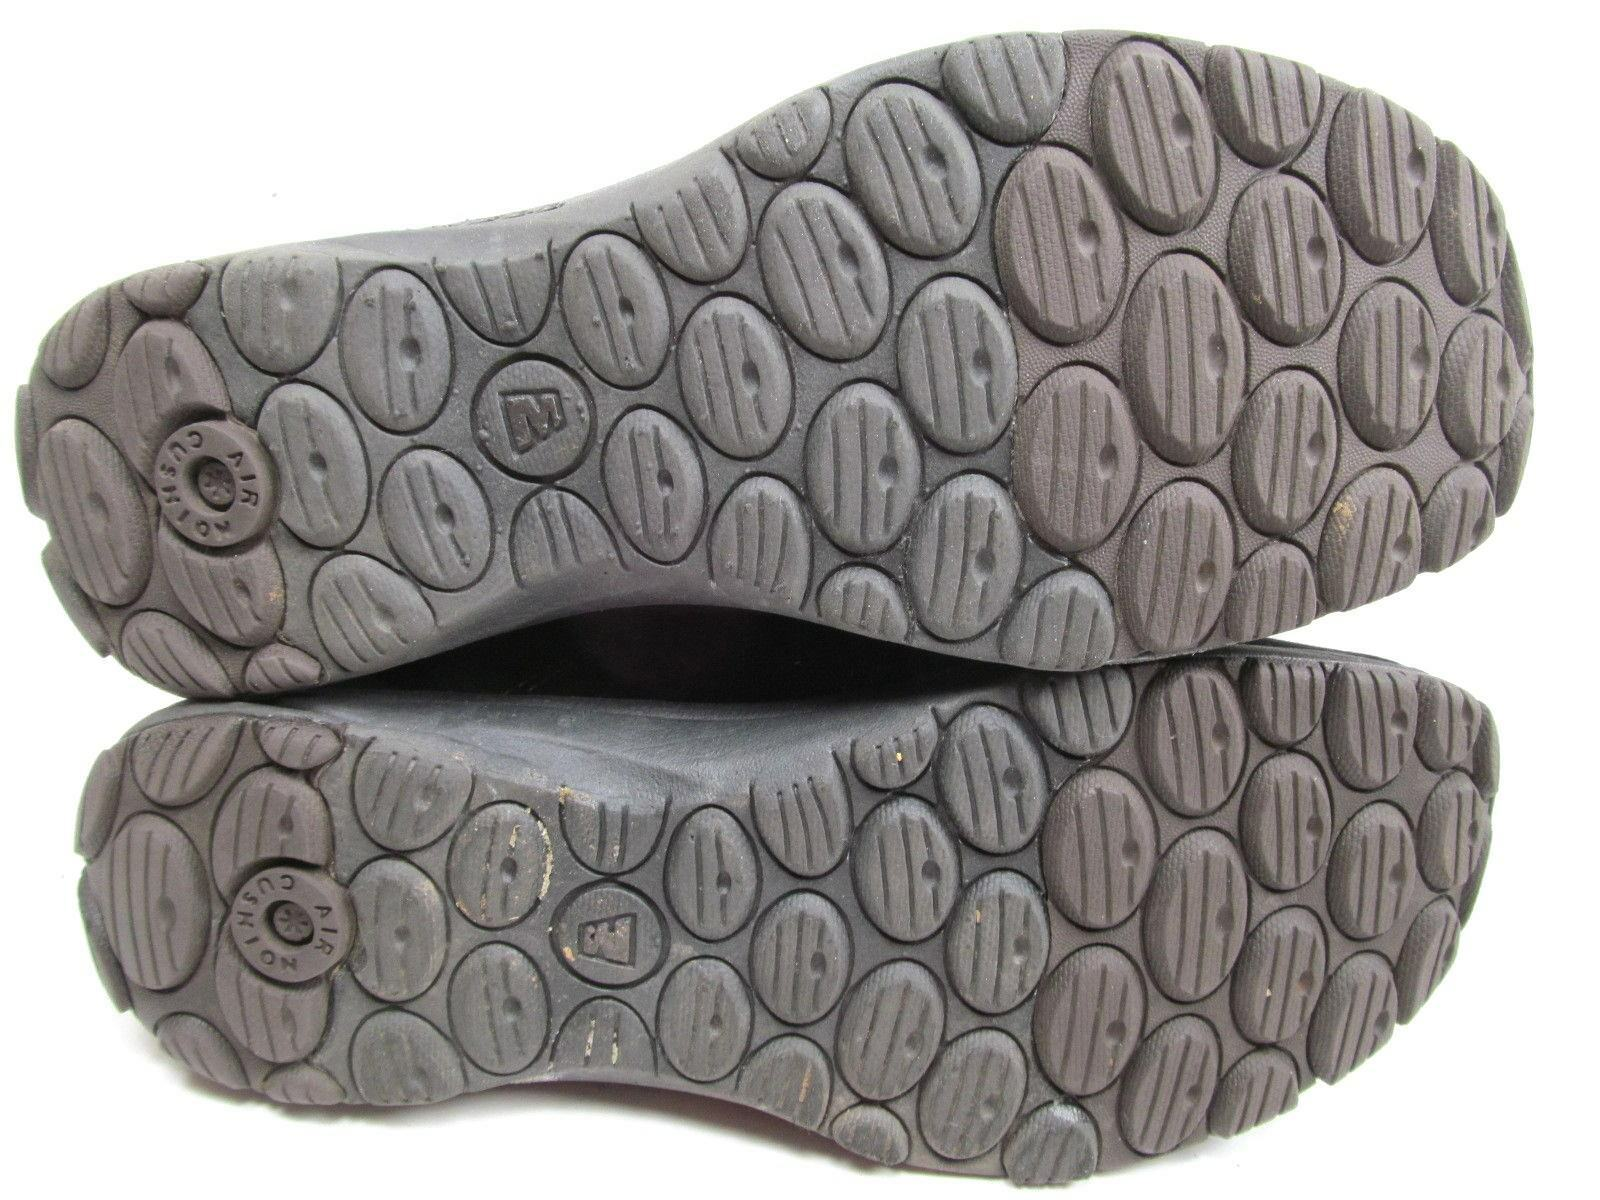 MERRELL Performance Women's Black Suede & Faux Fur Walking Shoes 9 M image 8